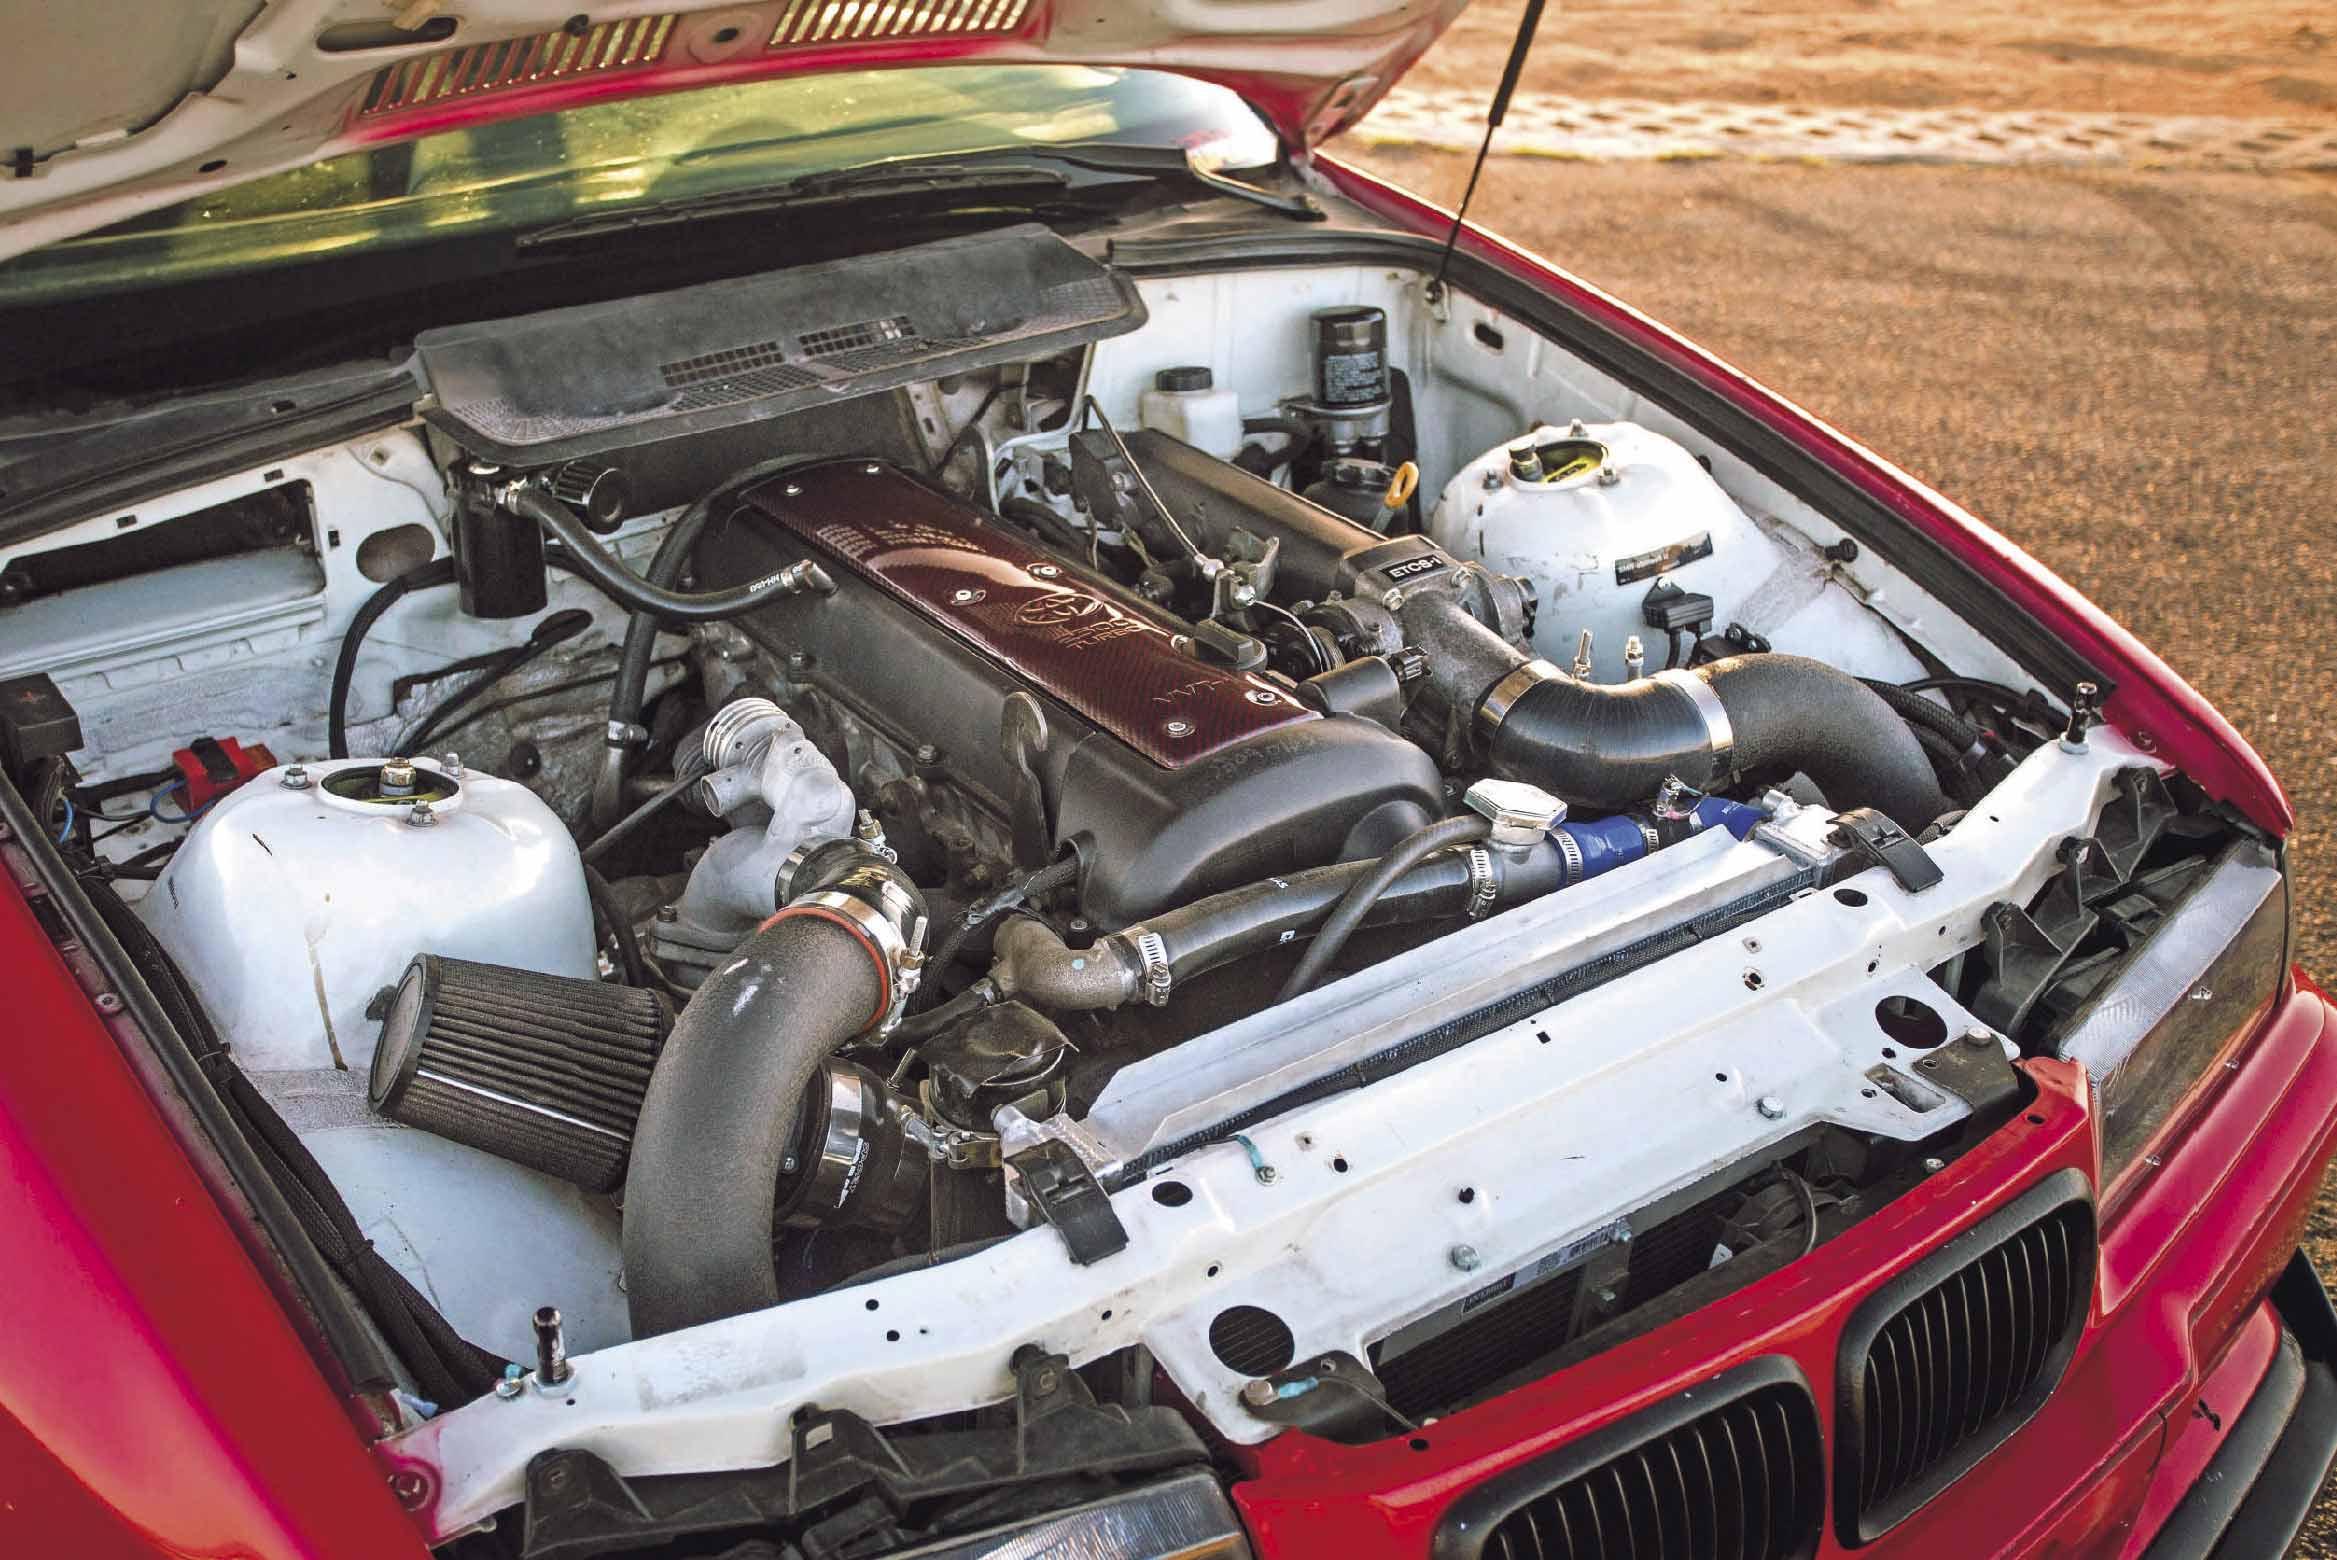 1JZ-swapped drift BMW M3 E36 - Drive-My Blogs - Drive